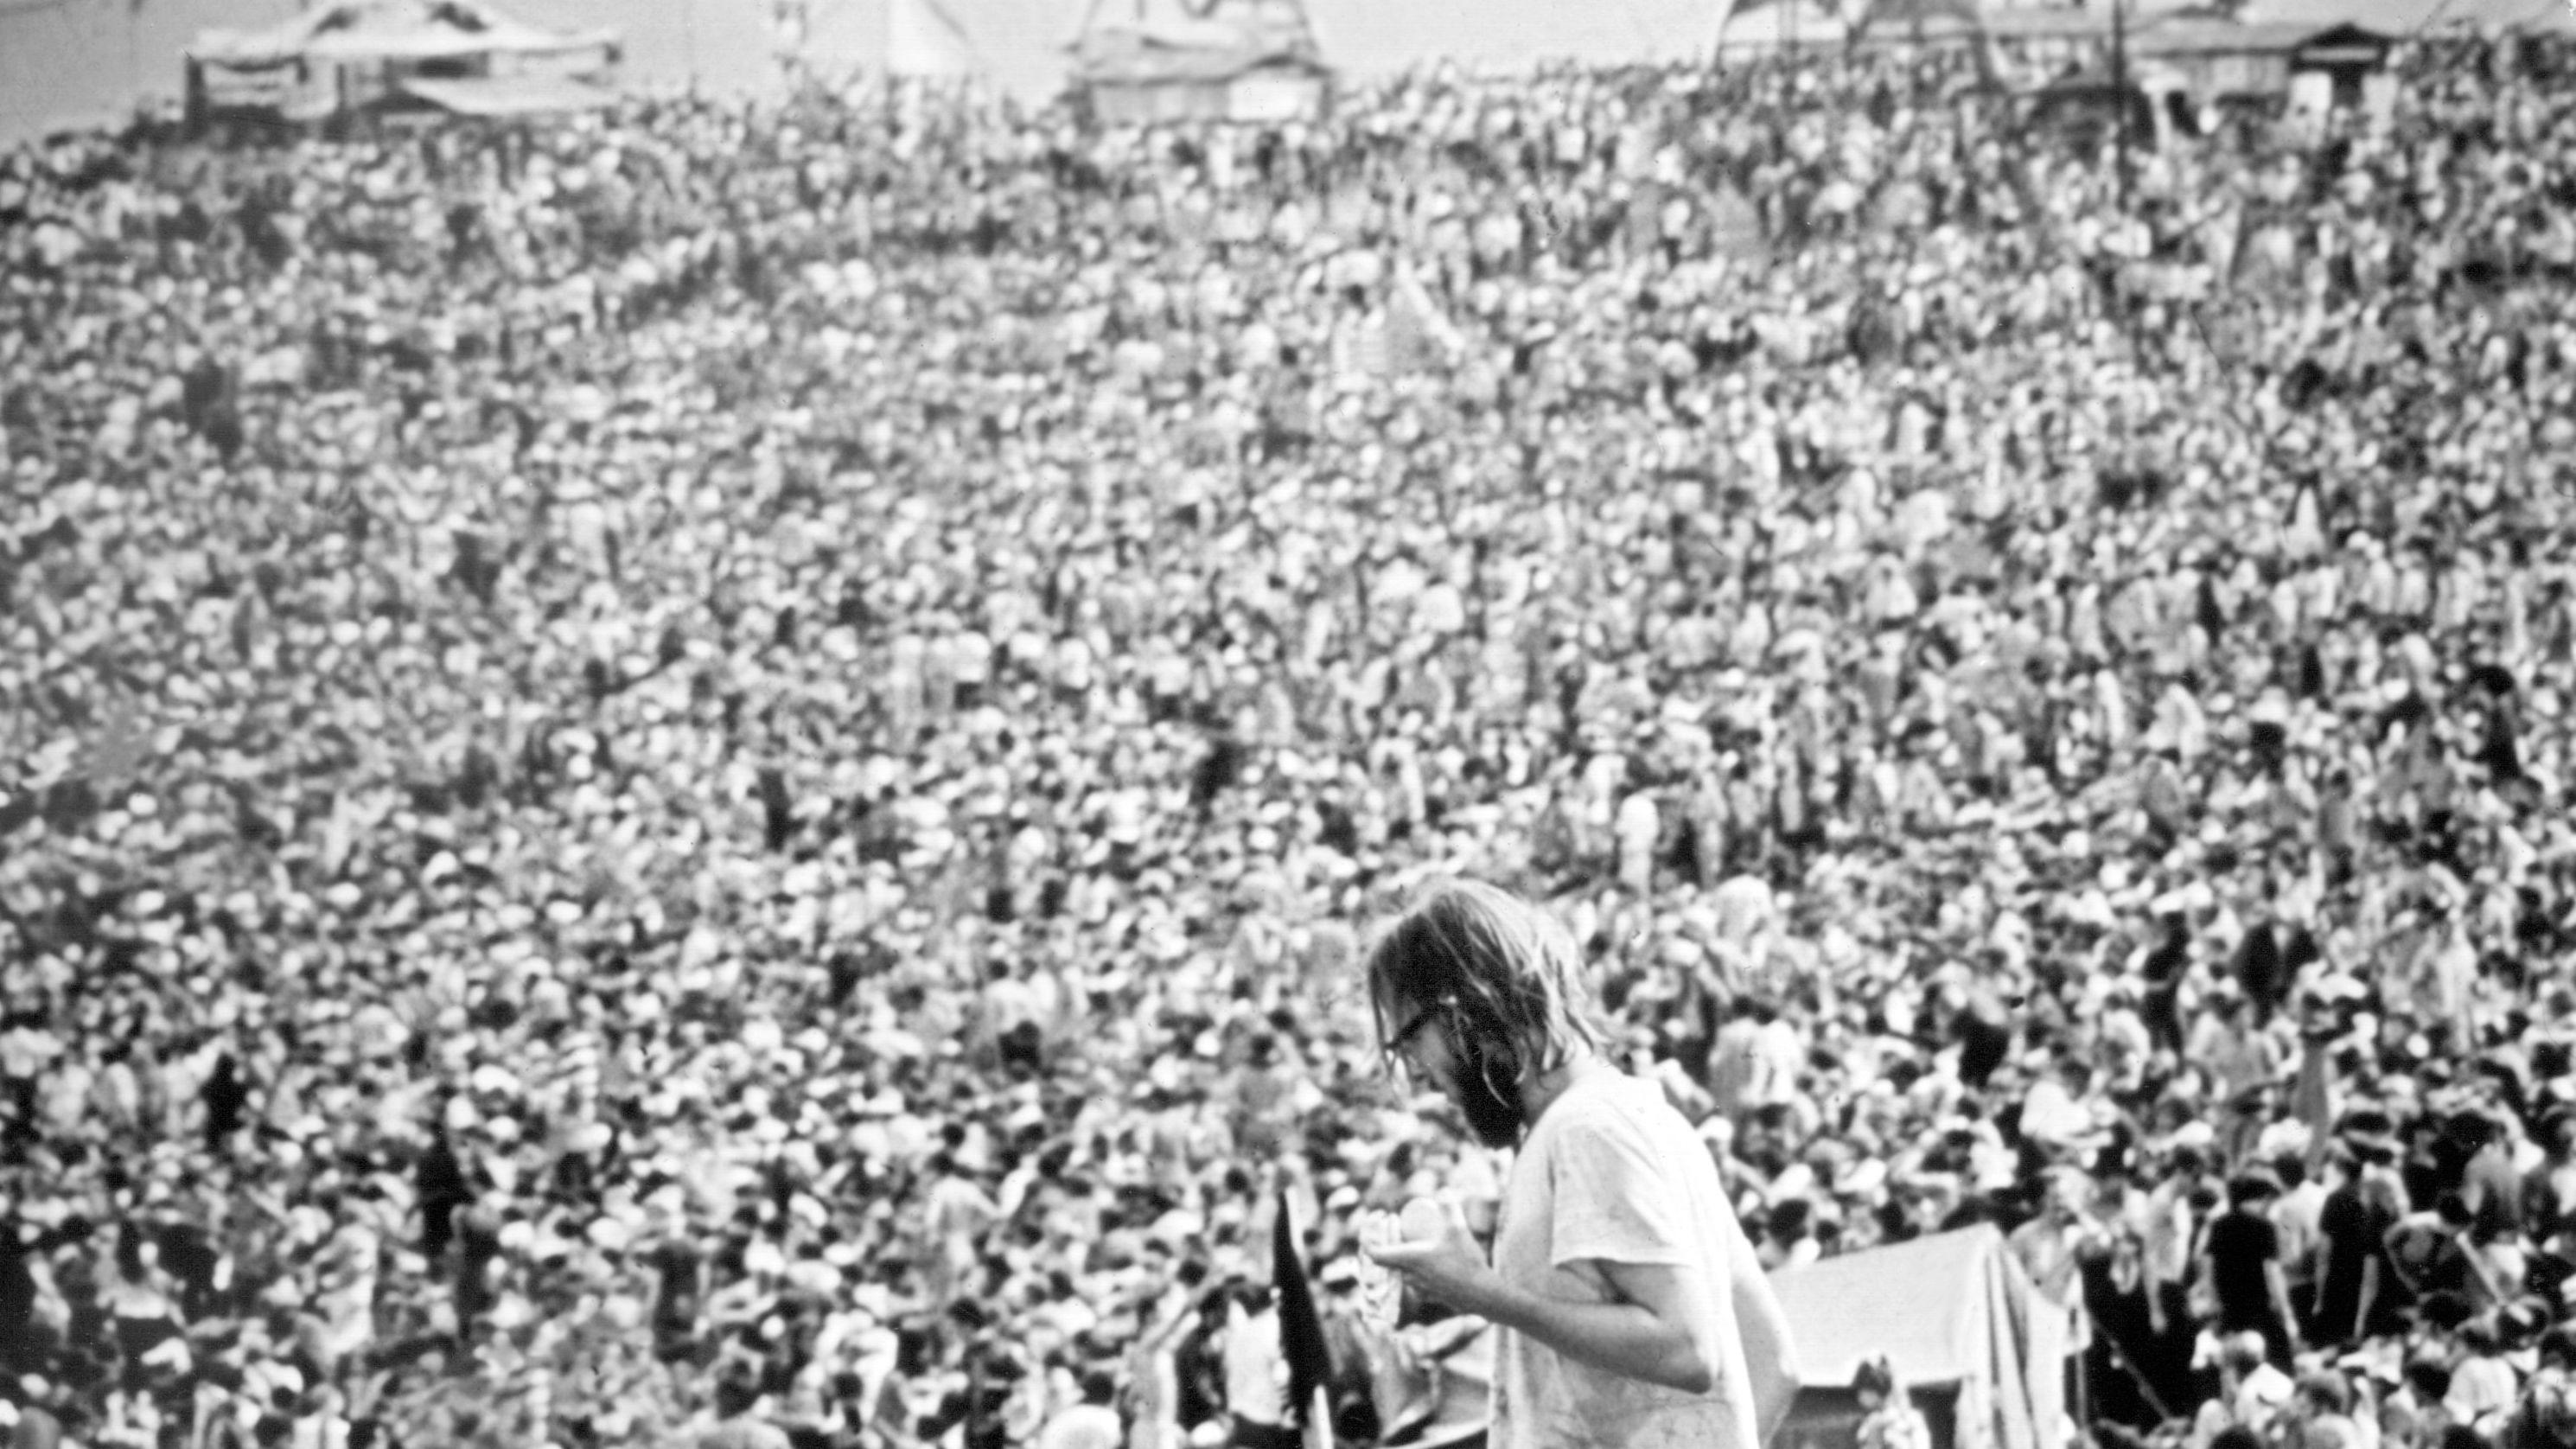 Menschenmenge bei Woodstock-Festival im August 1969